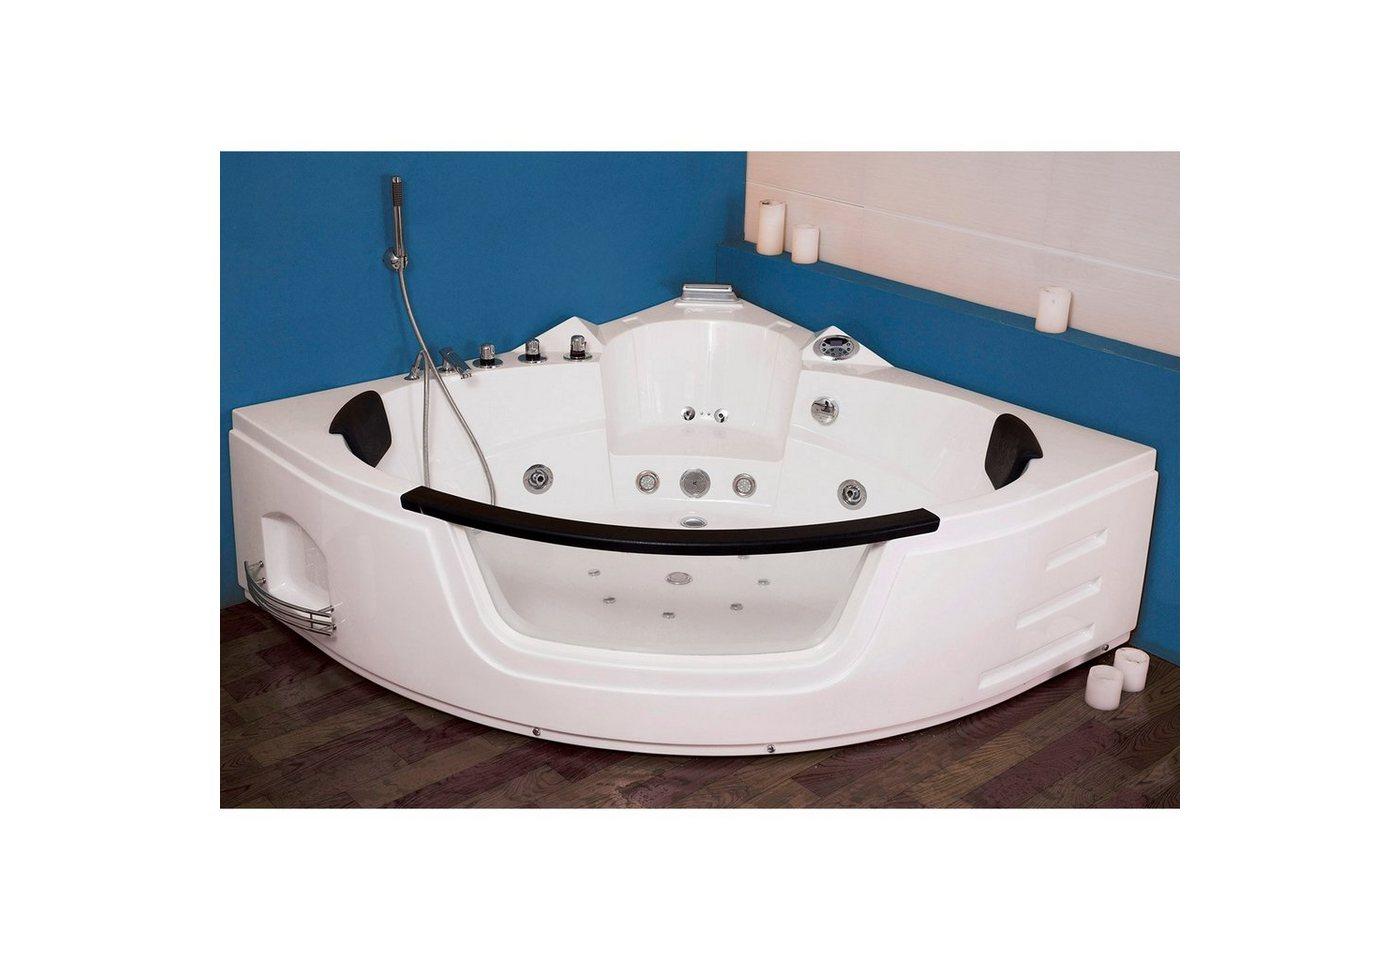 preisvergleich whirlpool eckbadewanne badewanne wanne pool thermostat willbilliger. Black Bedroom Furniture Sets. Home Design Ideas